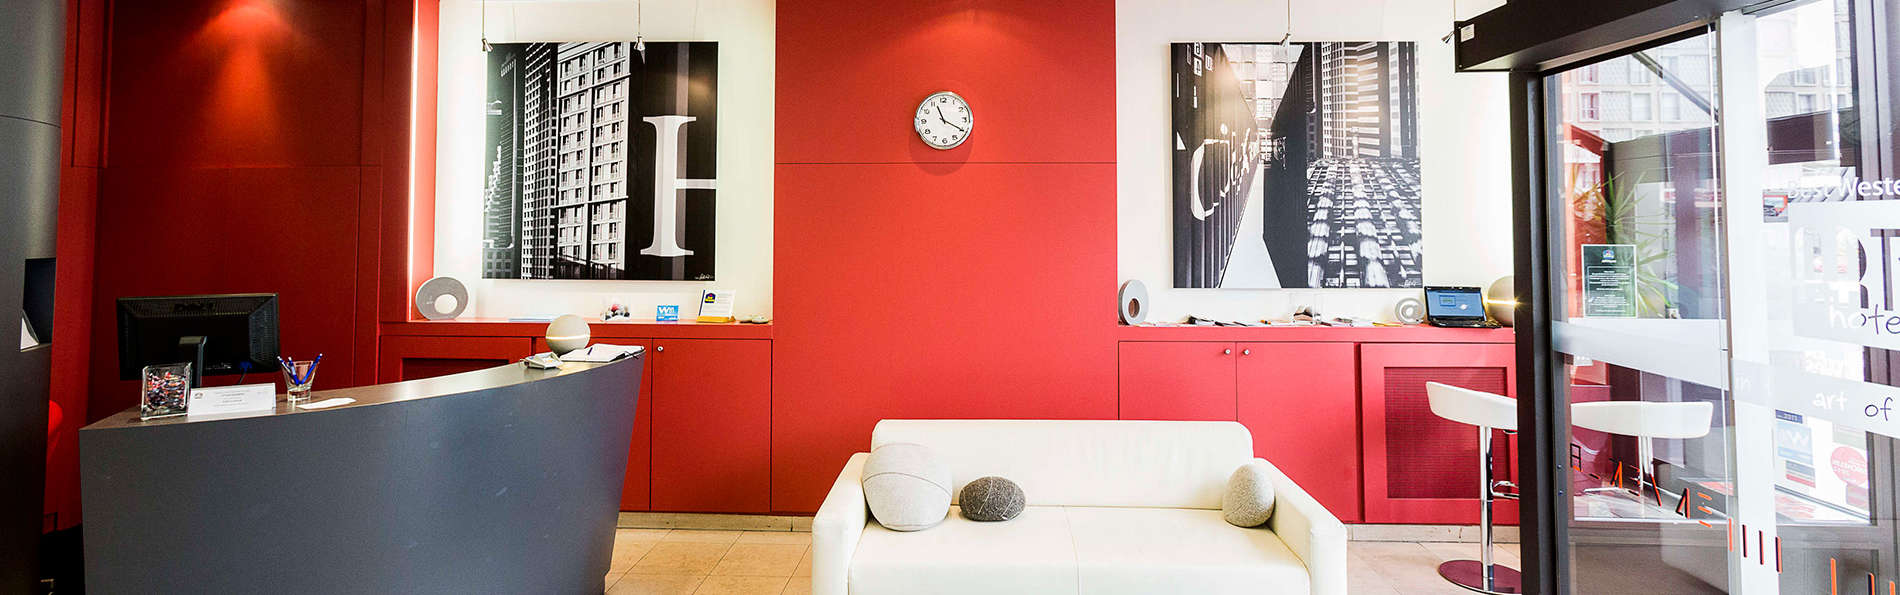 Best Western ARThotel - EDIT_ARThotel_Hall_1.jpg